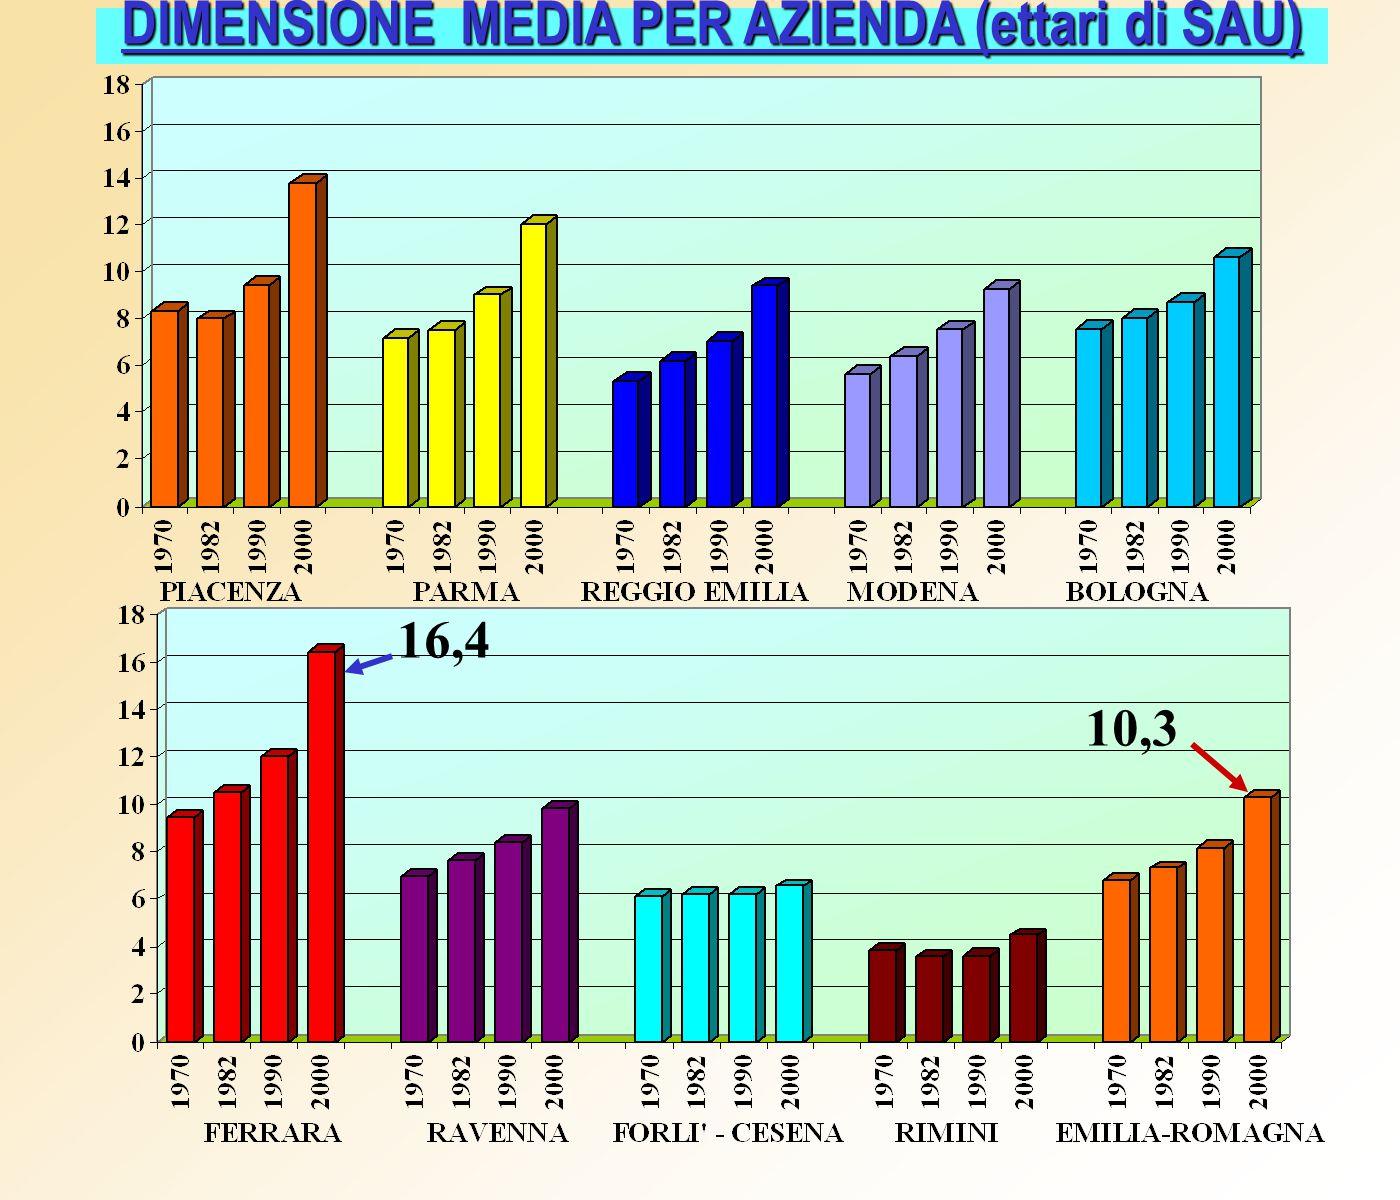 DIMENSIONE MEDIA PER AZIENDA (ettari di SAU) 16,4 10,3